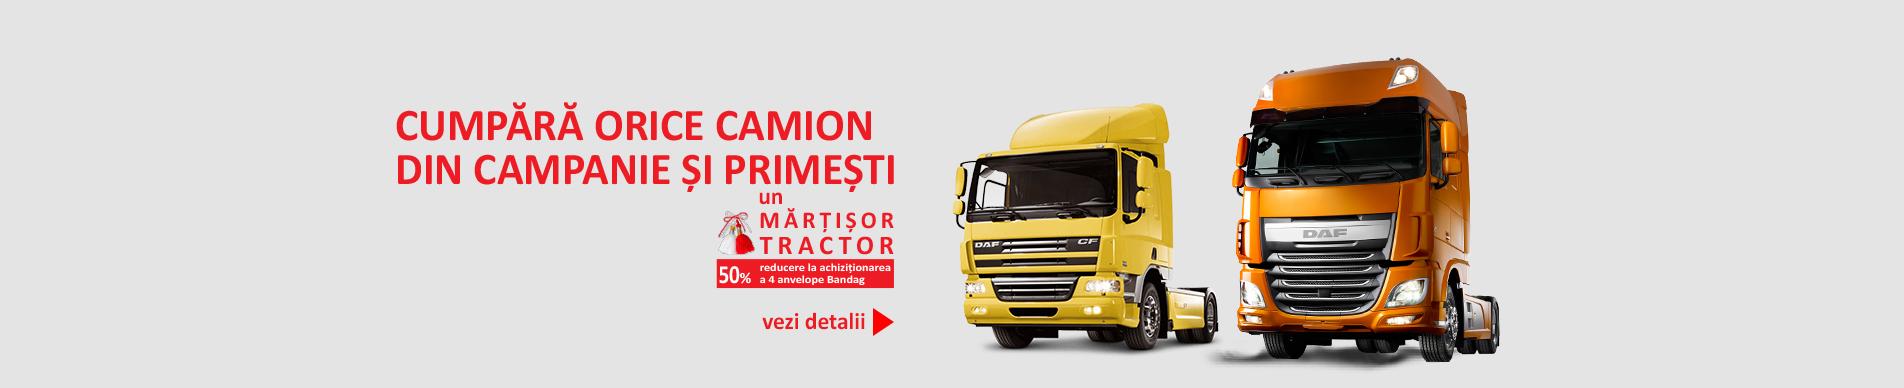 Martisor tractor